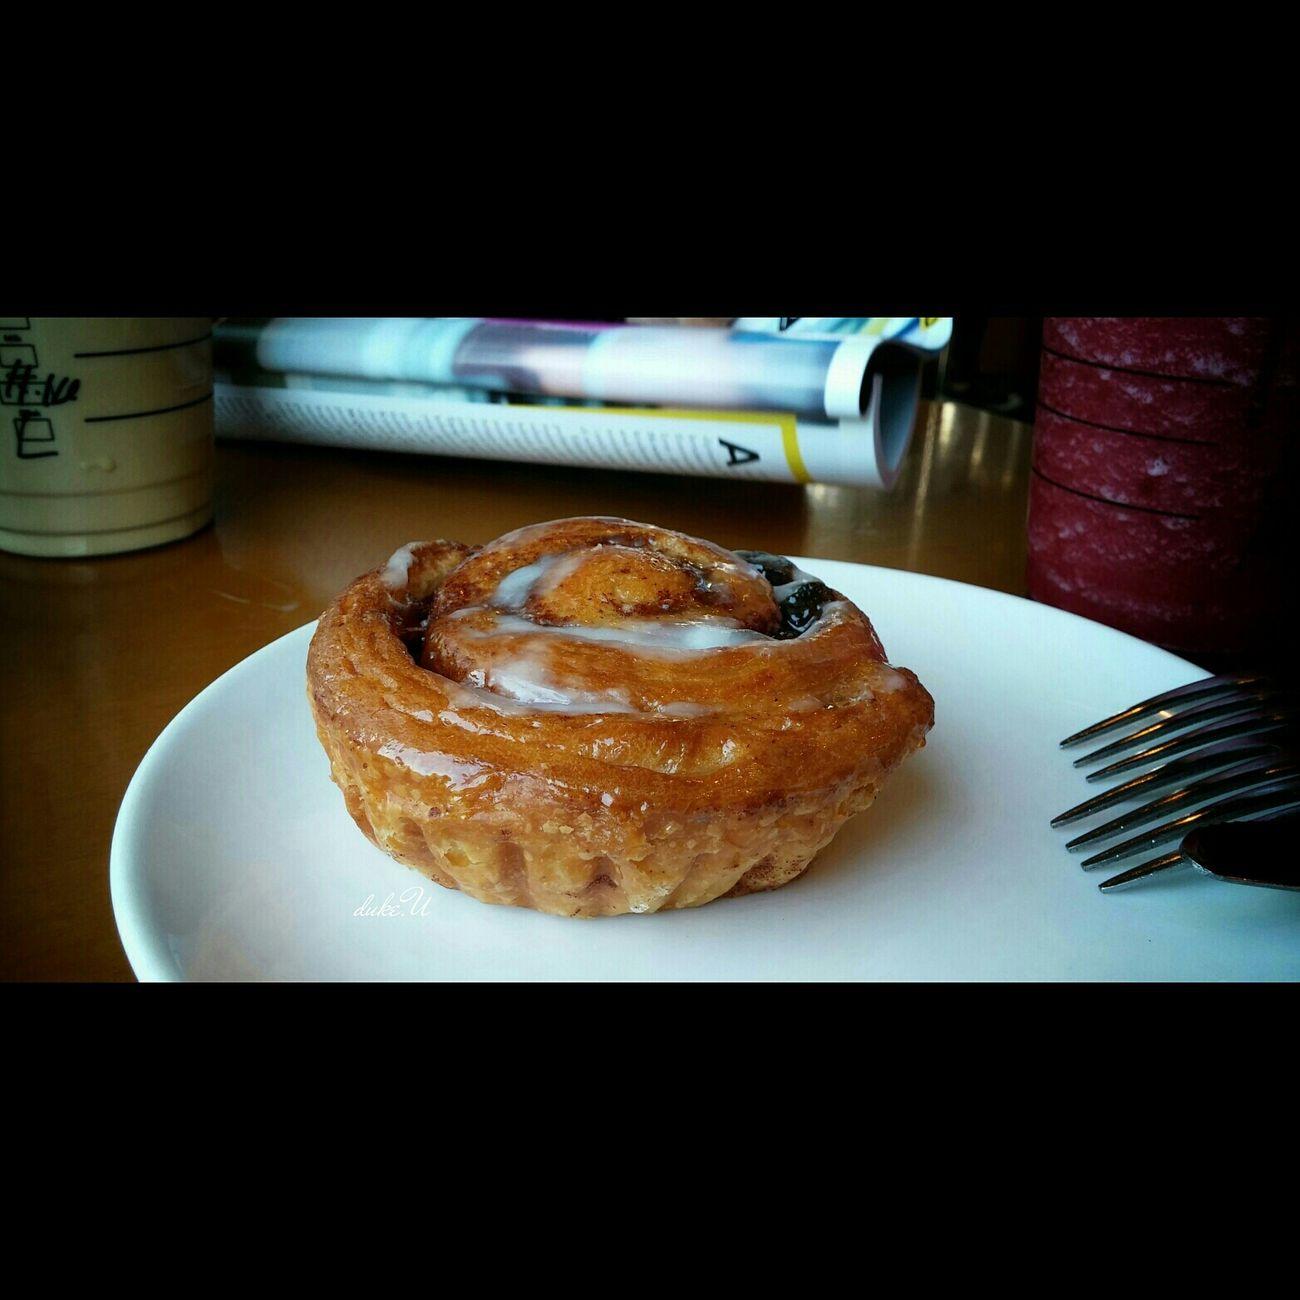 Cinamonroll Starbucks Pastry Patisserie